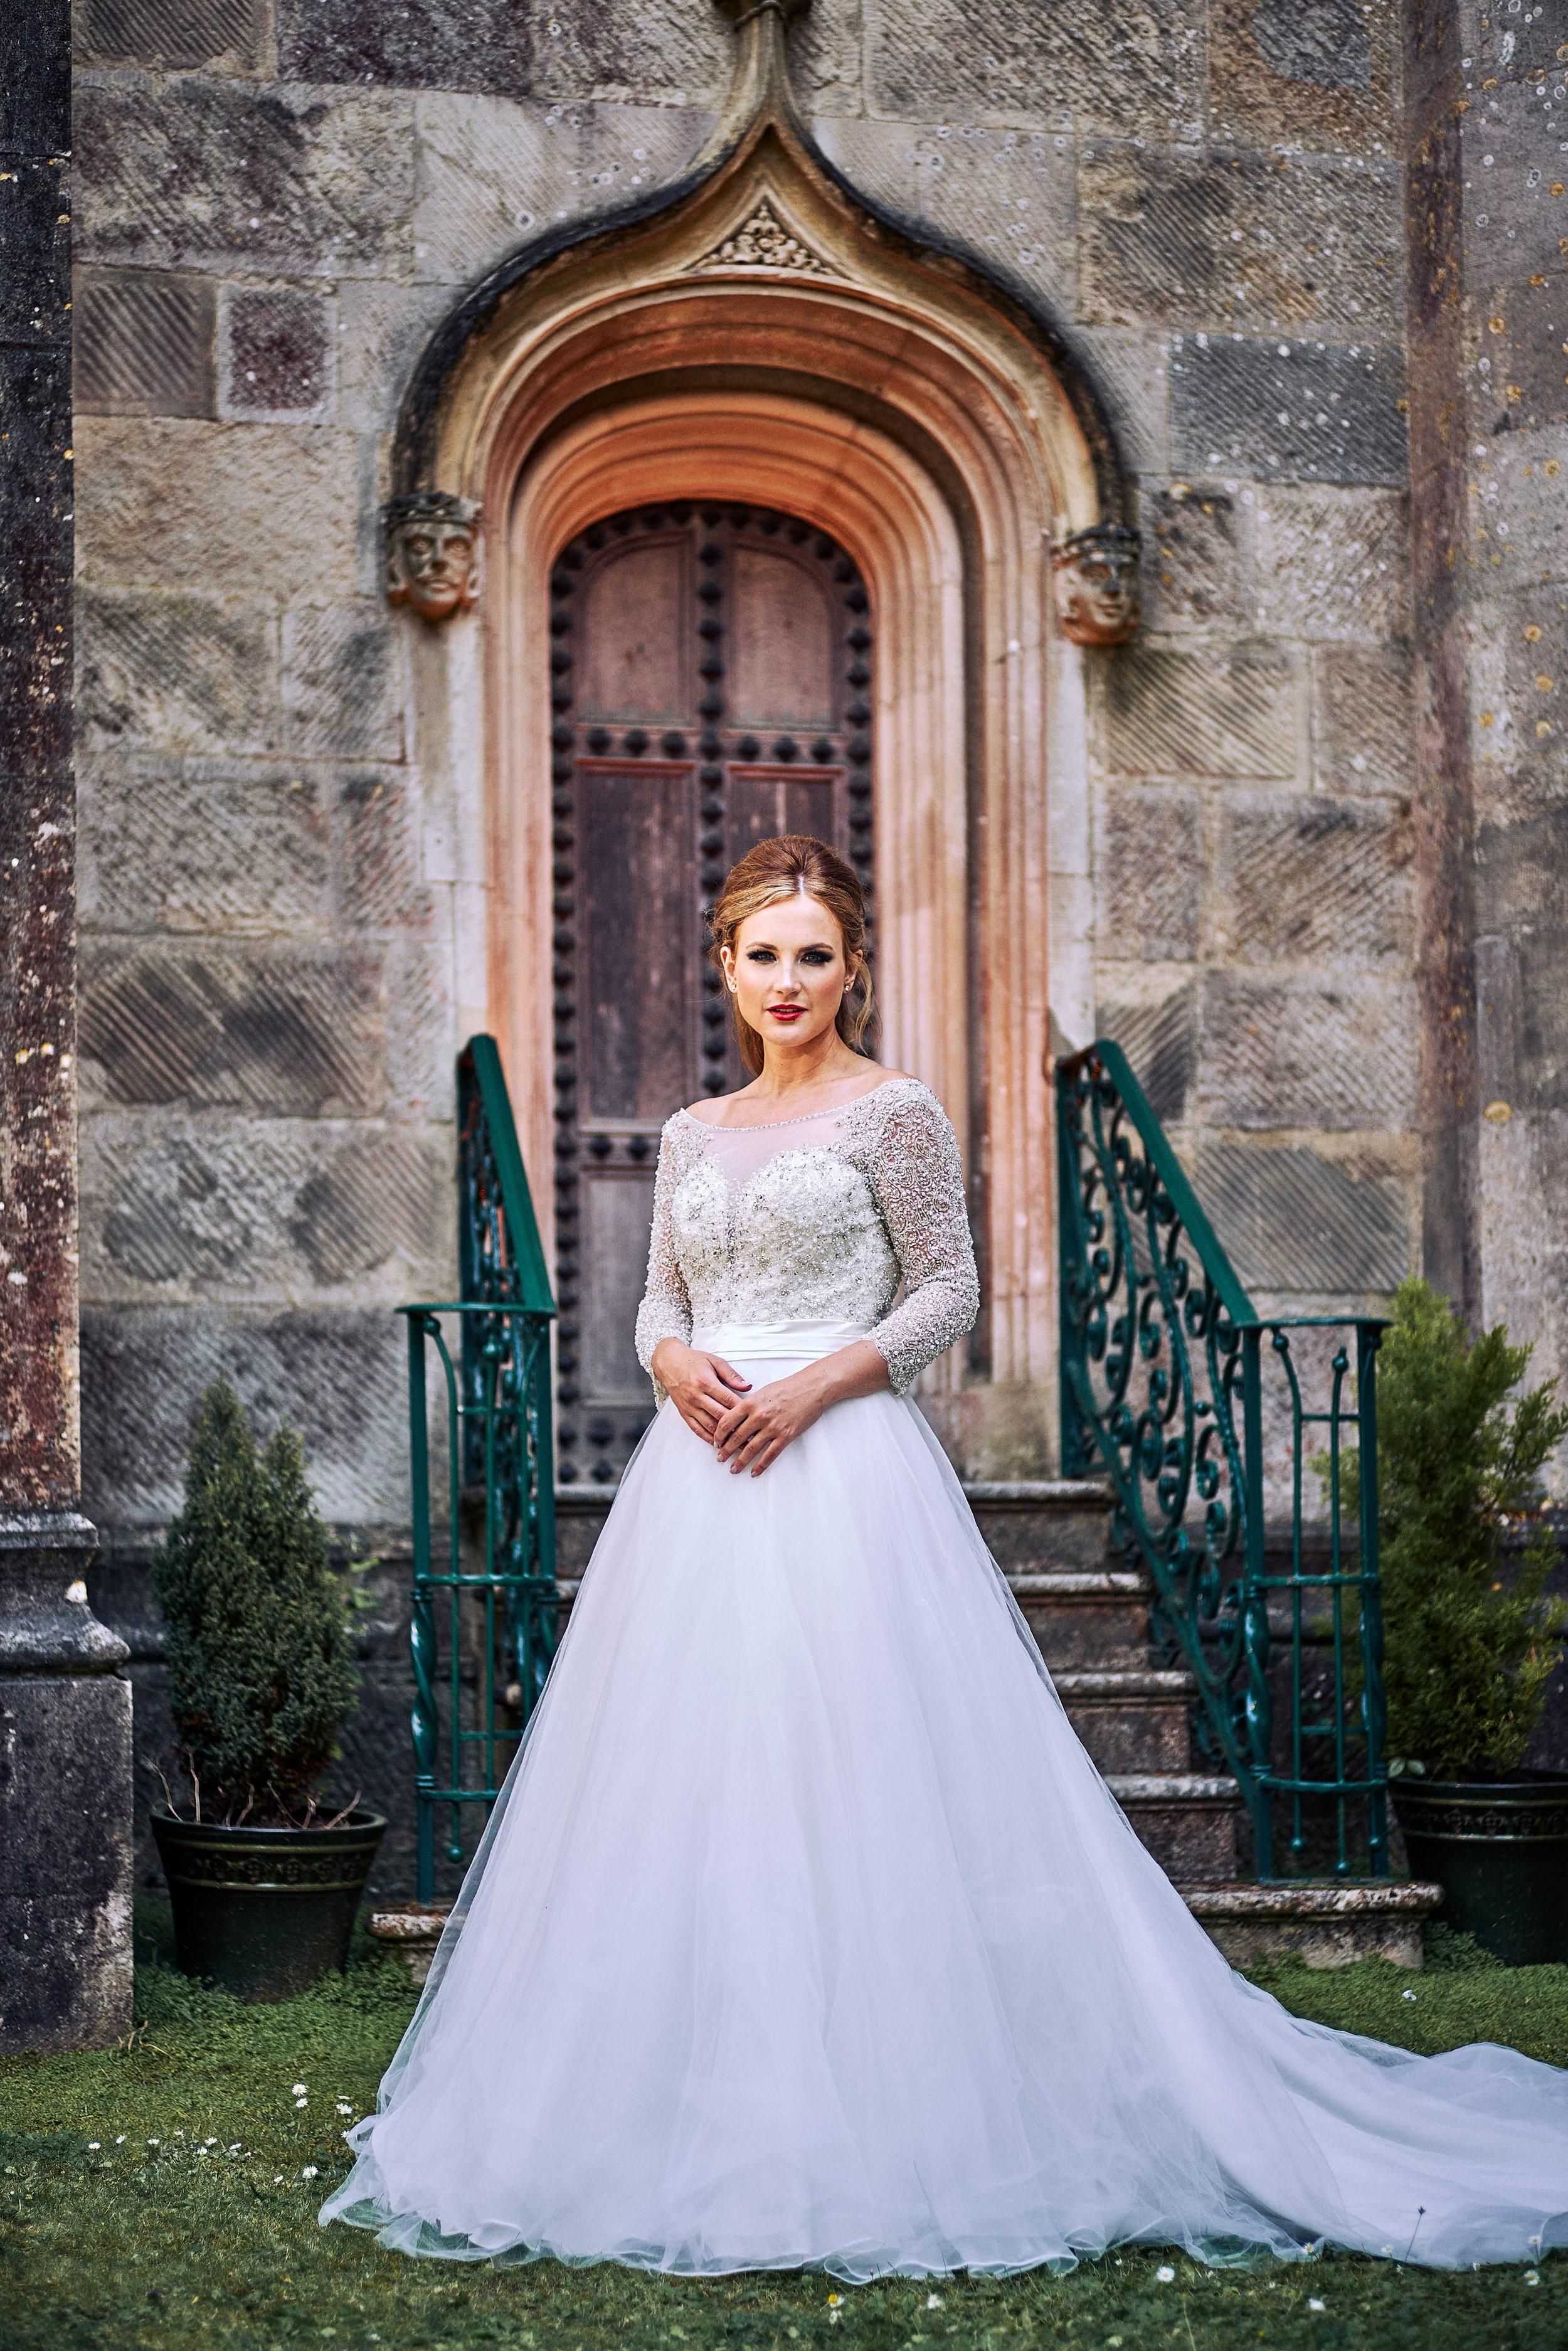 Sony Castle cameras Wedding Workshop at Highcliffe Castle Highcliffe  on 13 July 2018.